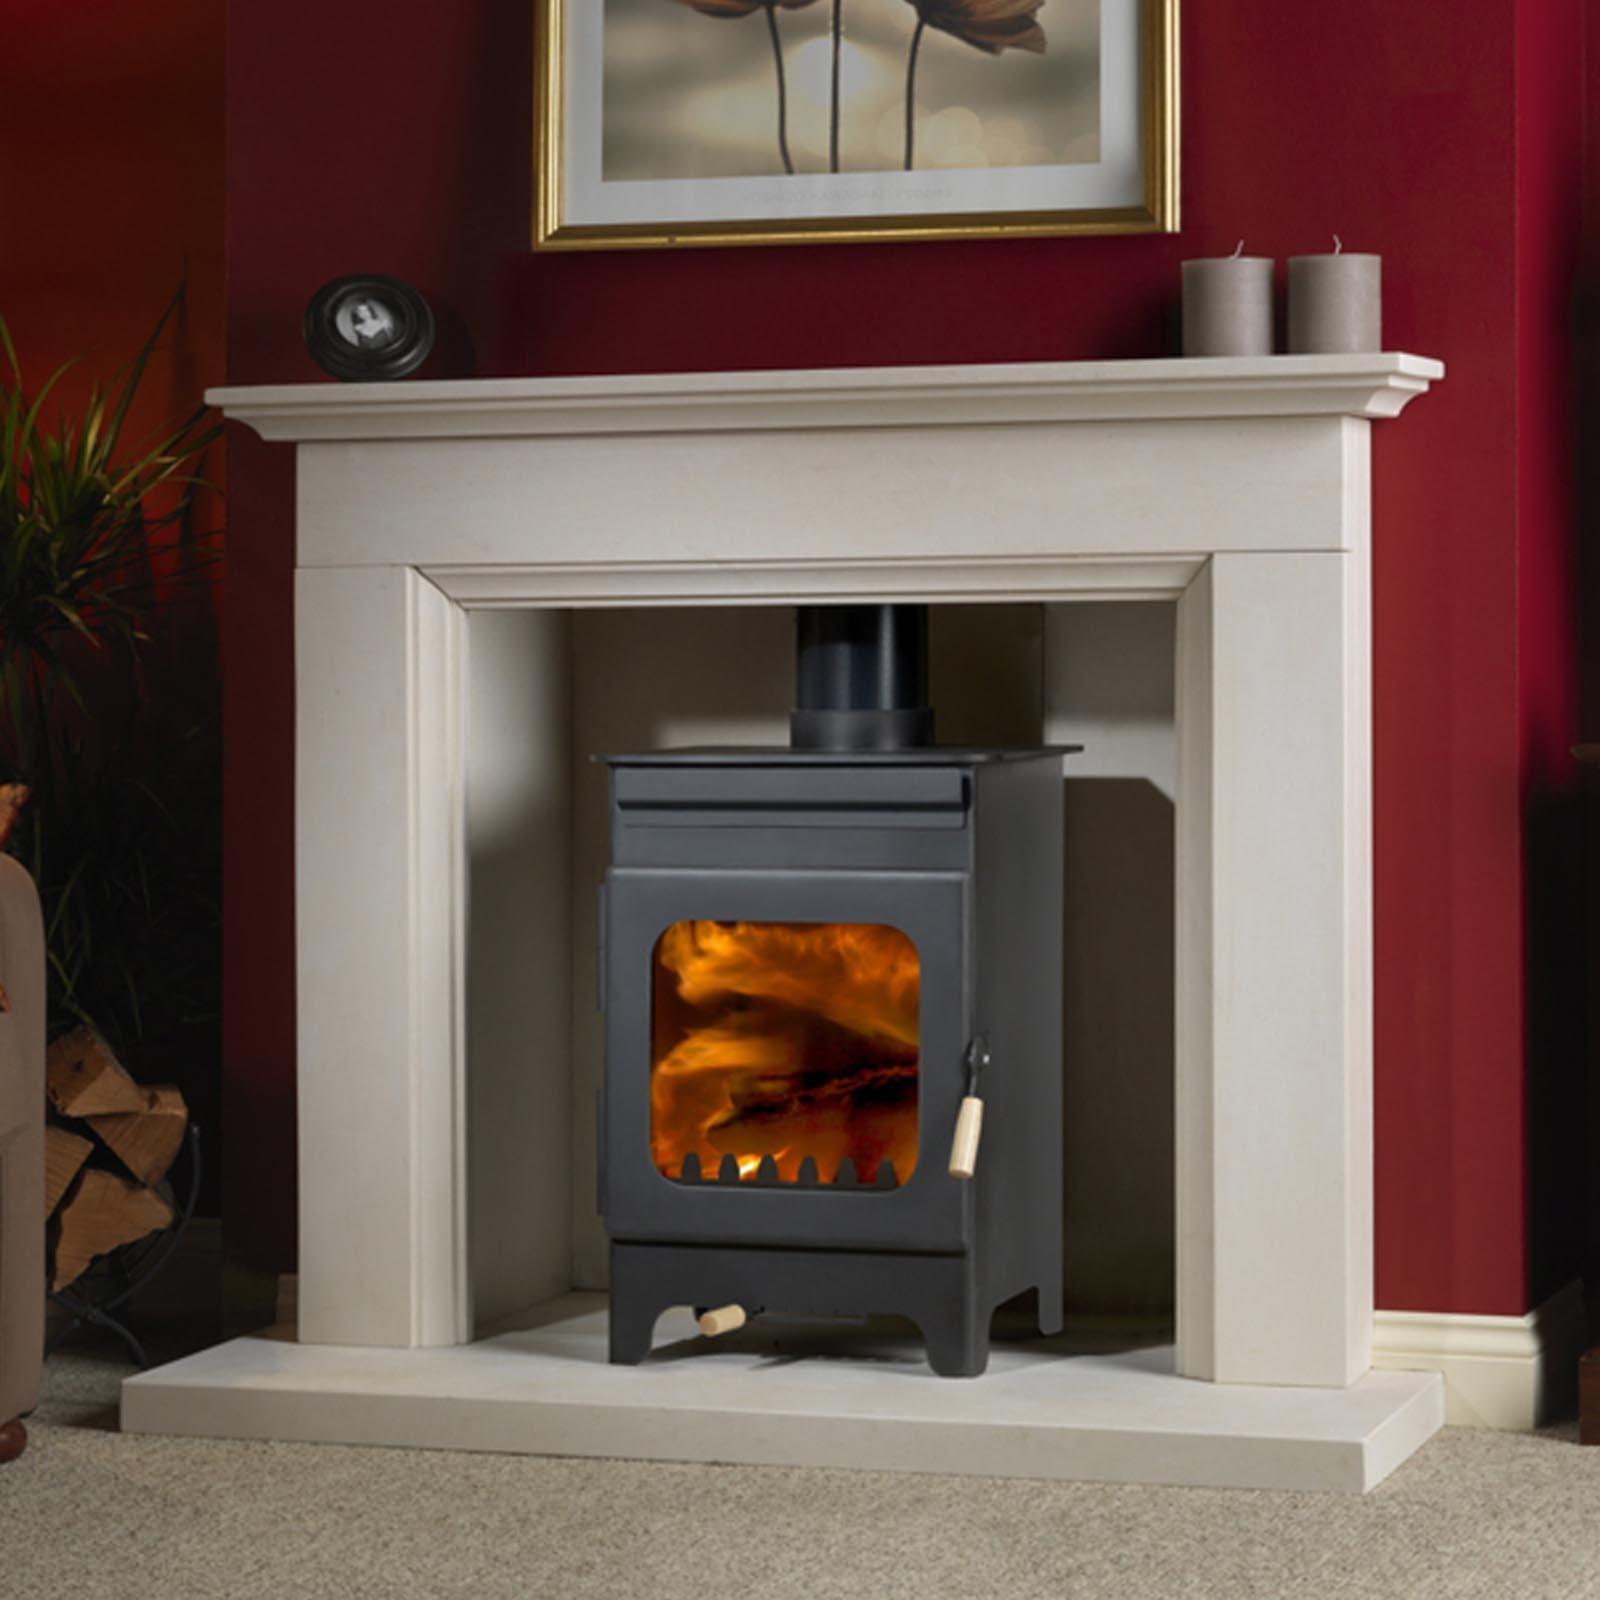 Amazing Instore Offers Burley Fireball Hollywell Wood